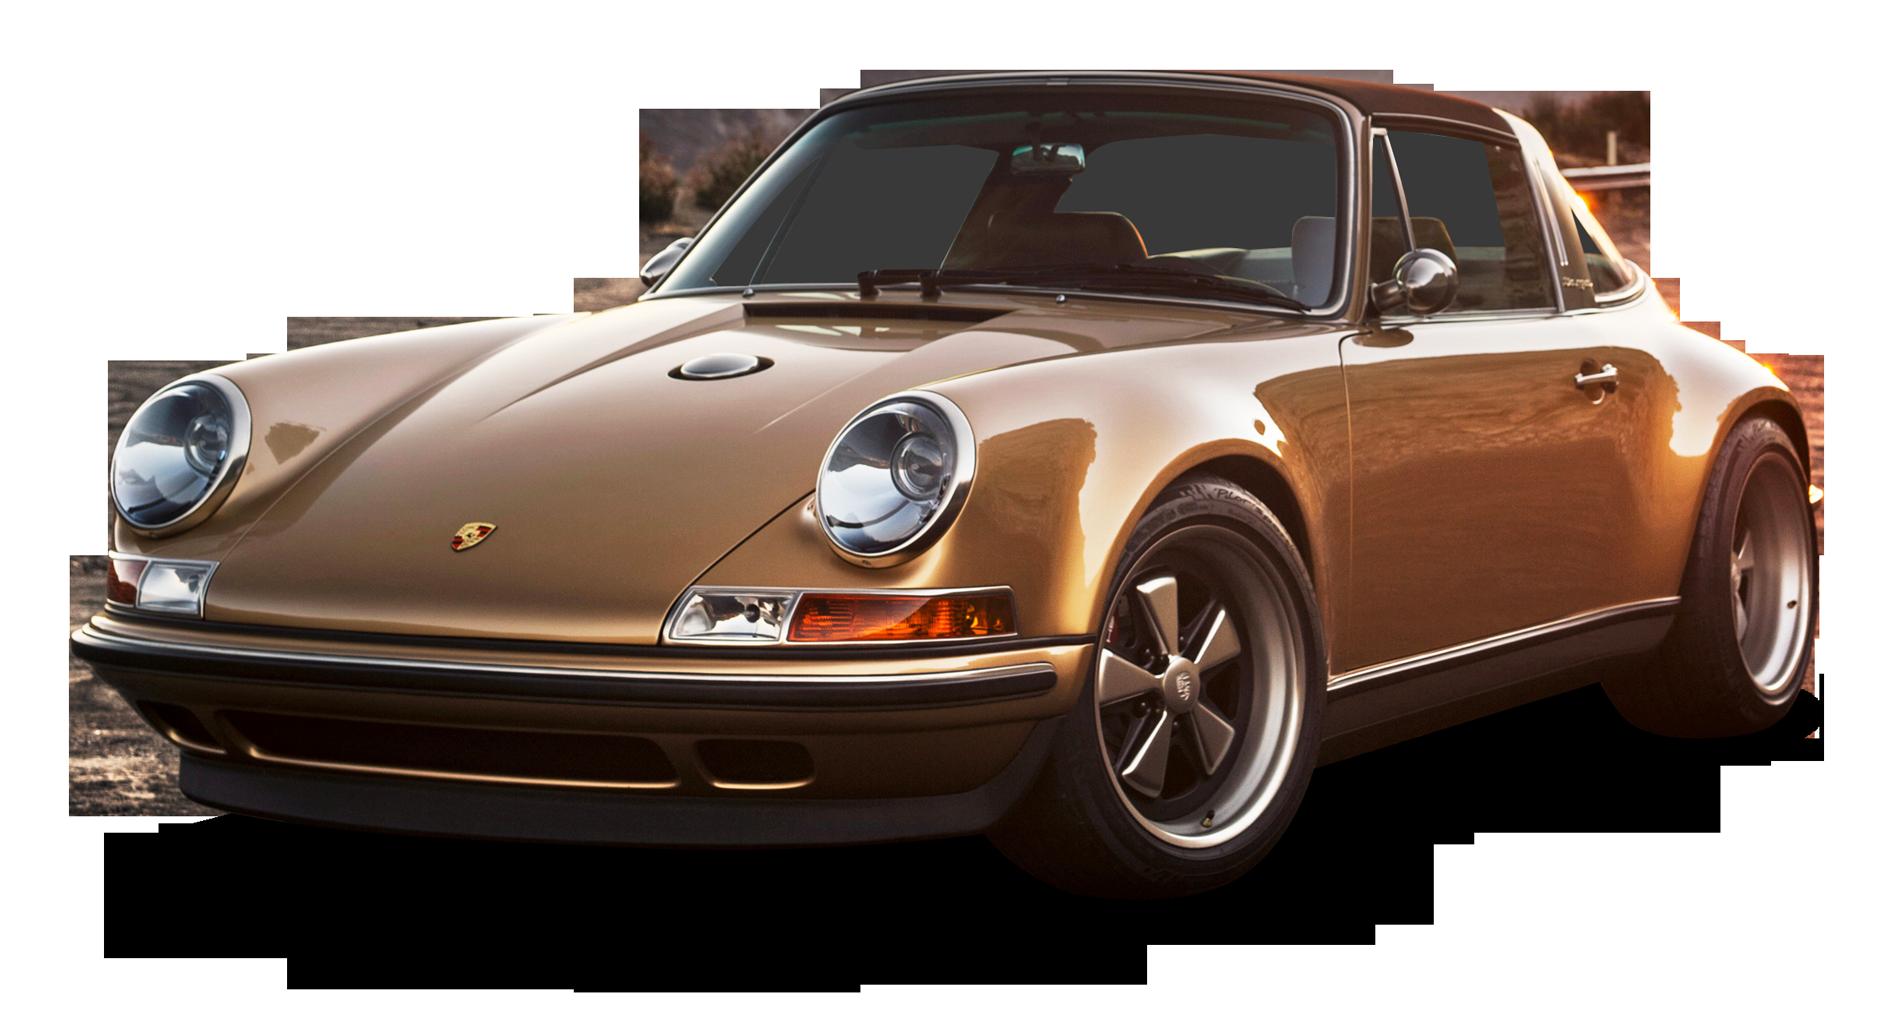 Singer Porsche 911 Targa Car PNG Image